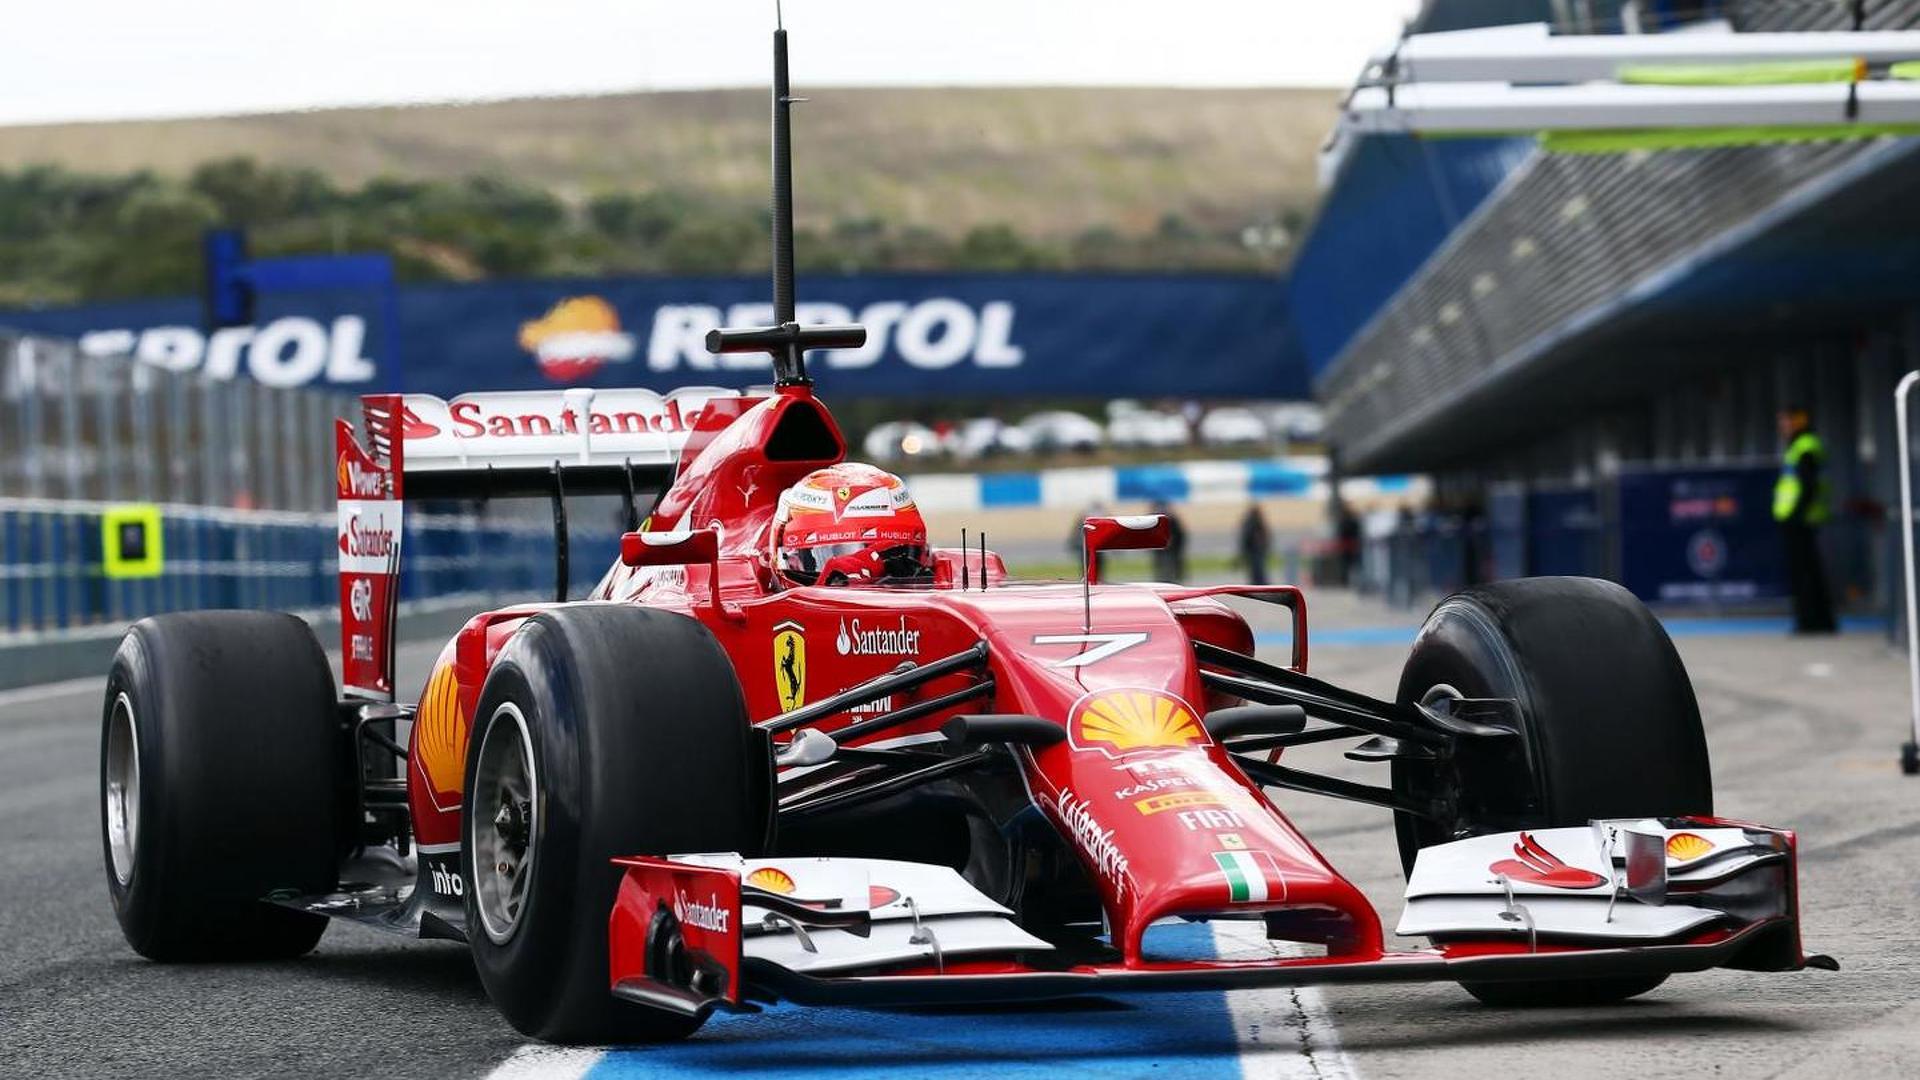 Report - Ferrari sandbagging at Jerez?